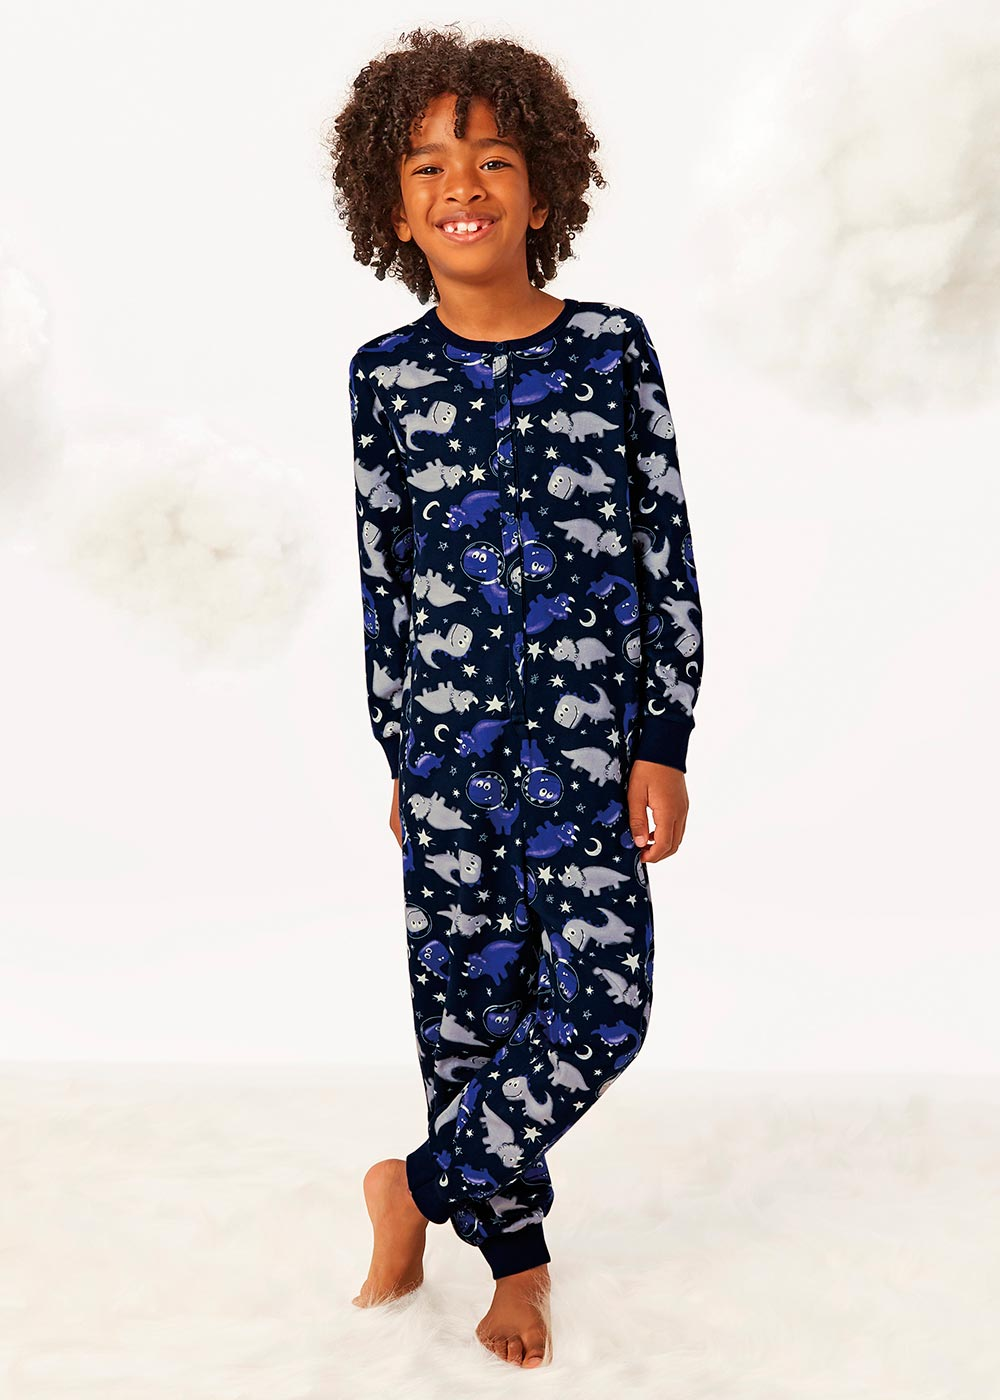 Macacão/Pijama Infantil Masculino Inverno Azul Malwee